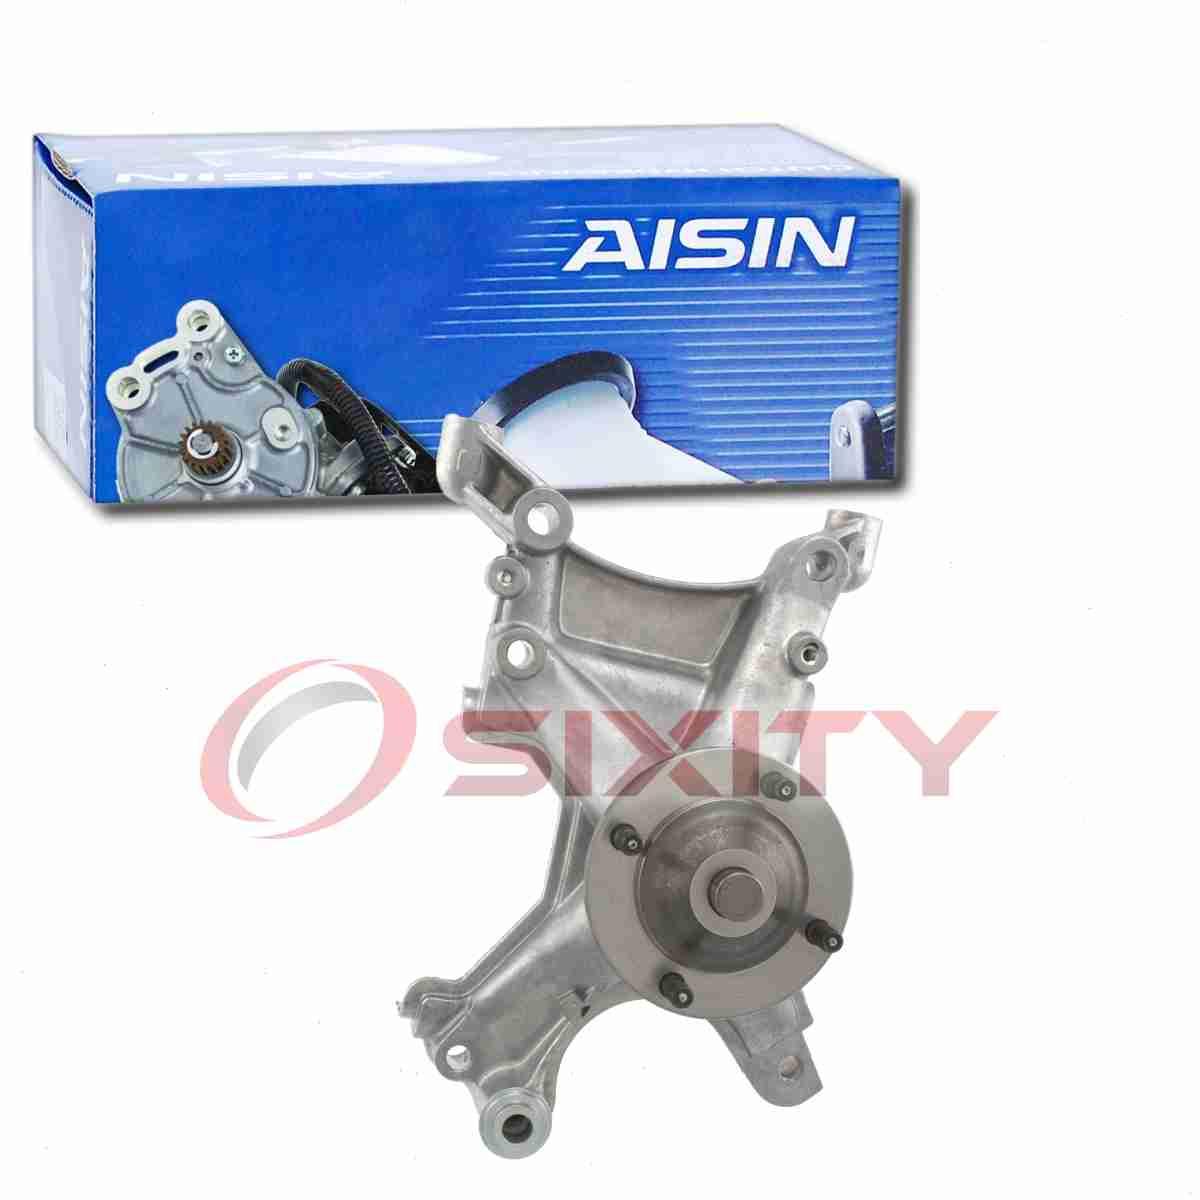 AISIN Cooling Fan Pulley Bracket for 1990-1997 Lexus LS400 4.0L V8 gz